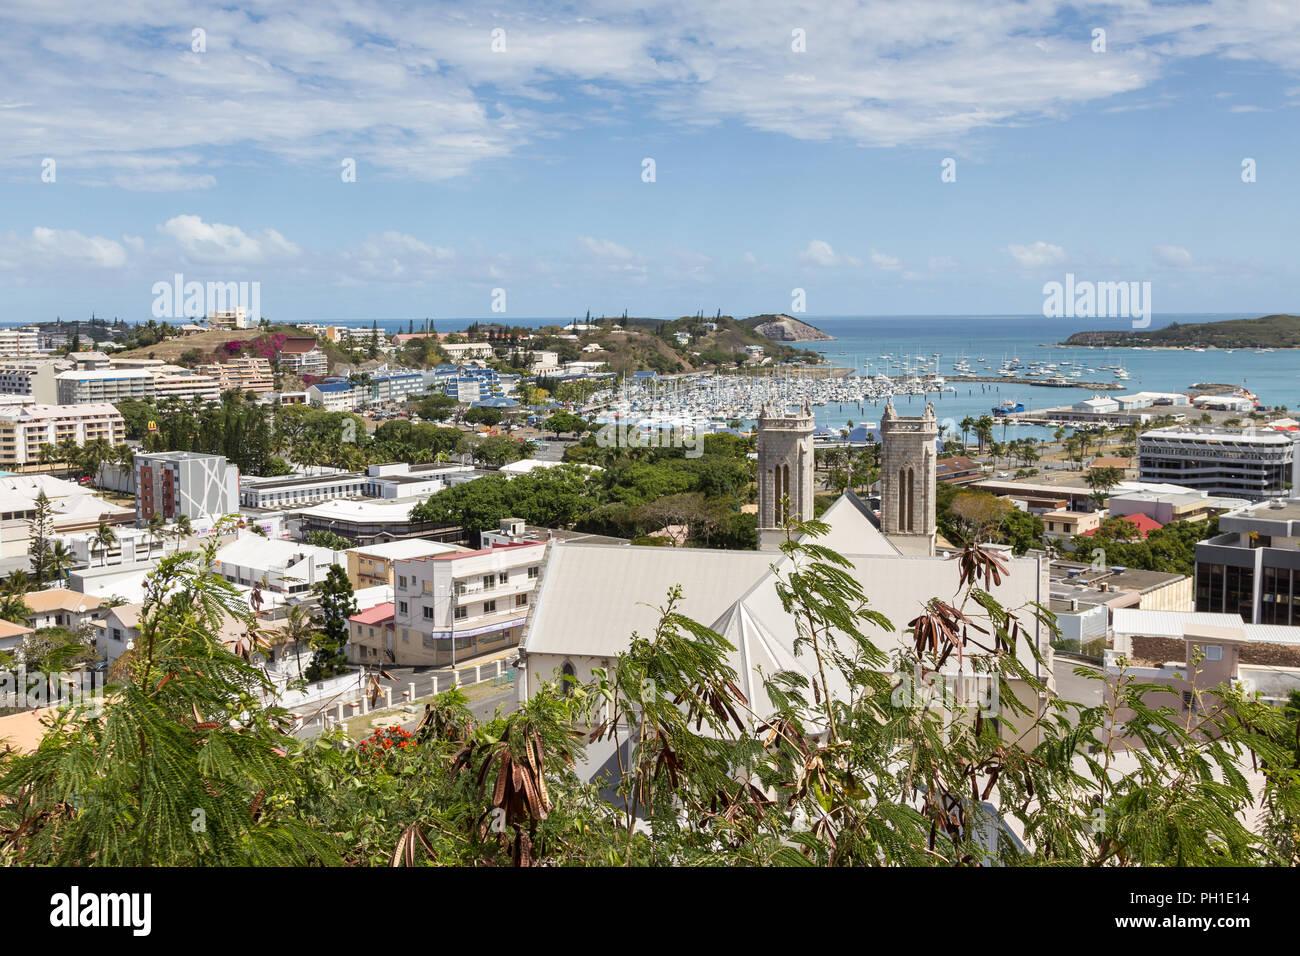 View over Noumea, New Caledonia - Stock Image